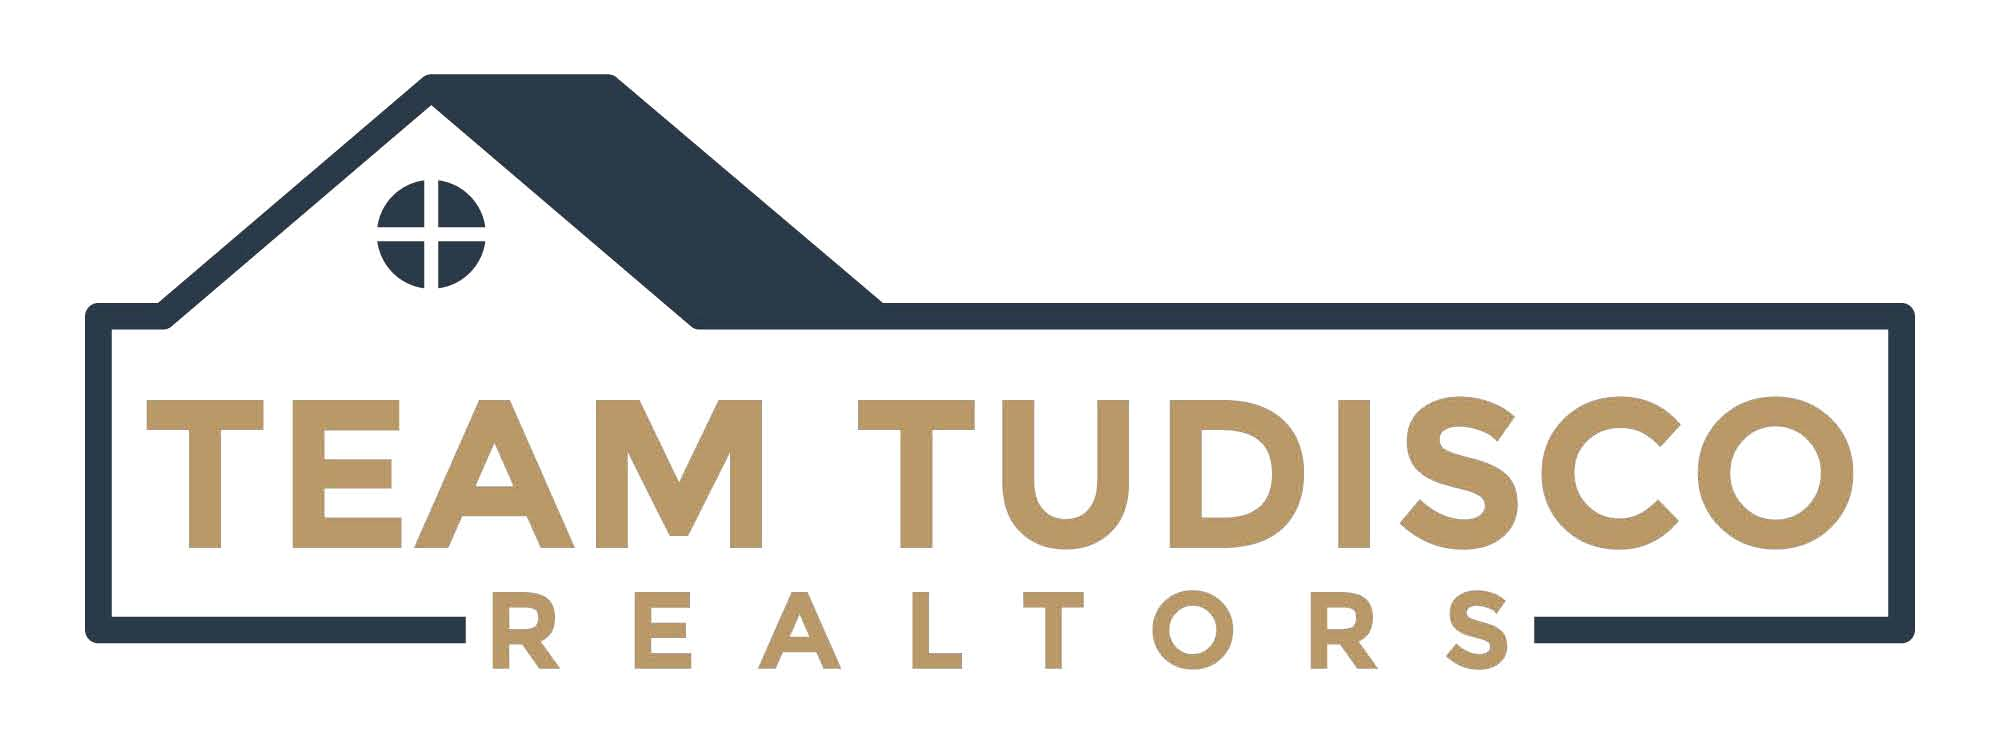 Team Tudisco Realtors of Wheatland Realty logo